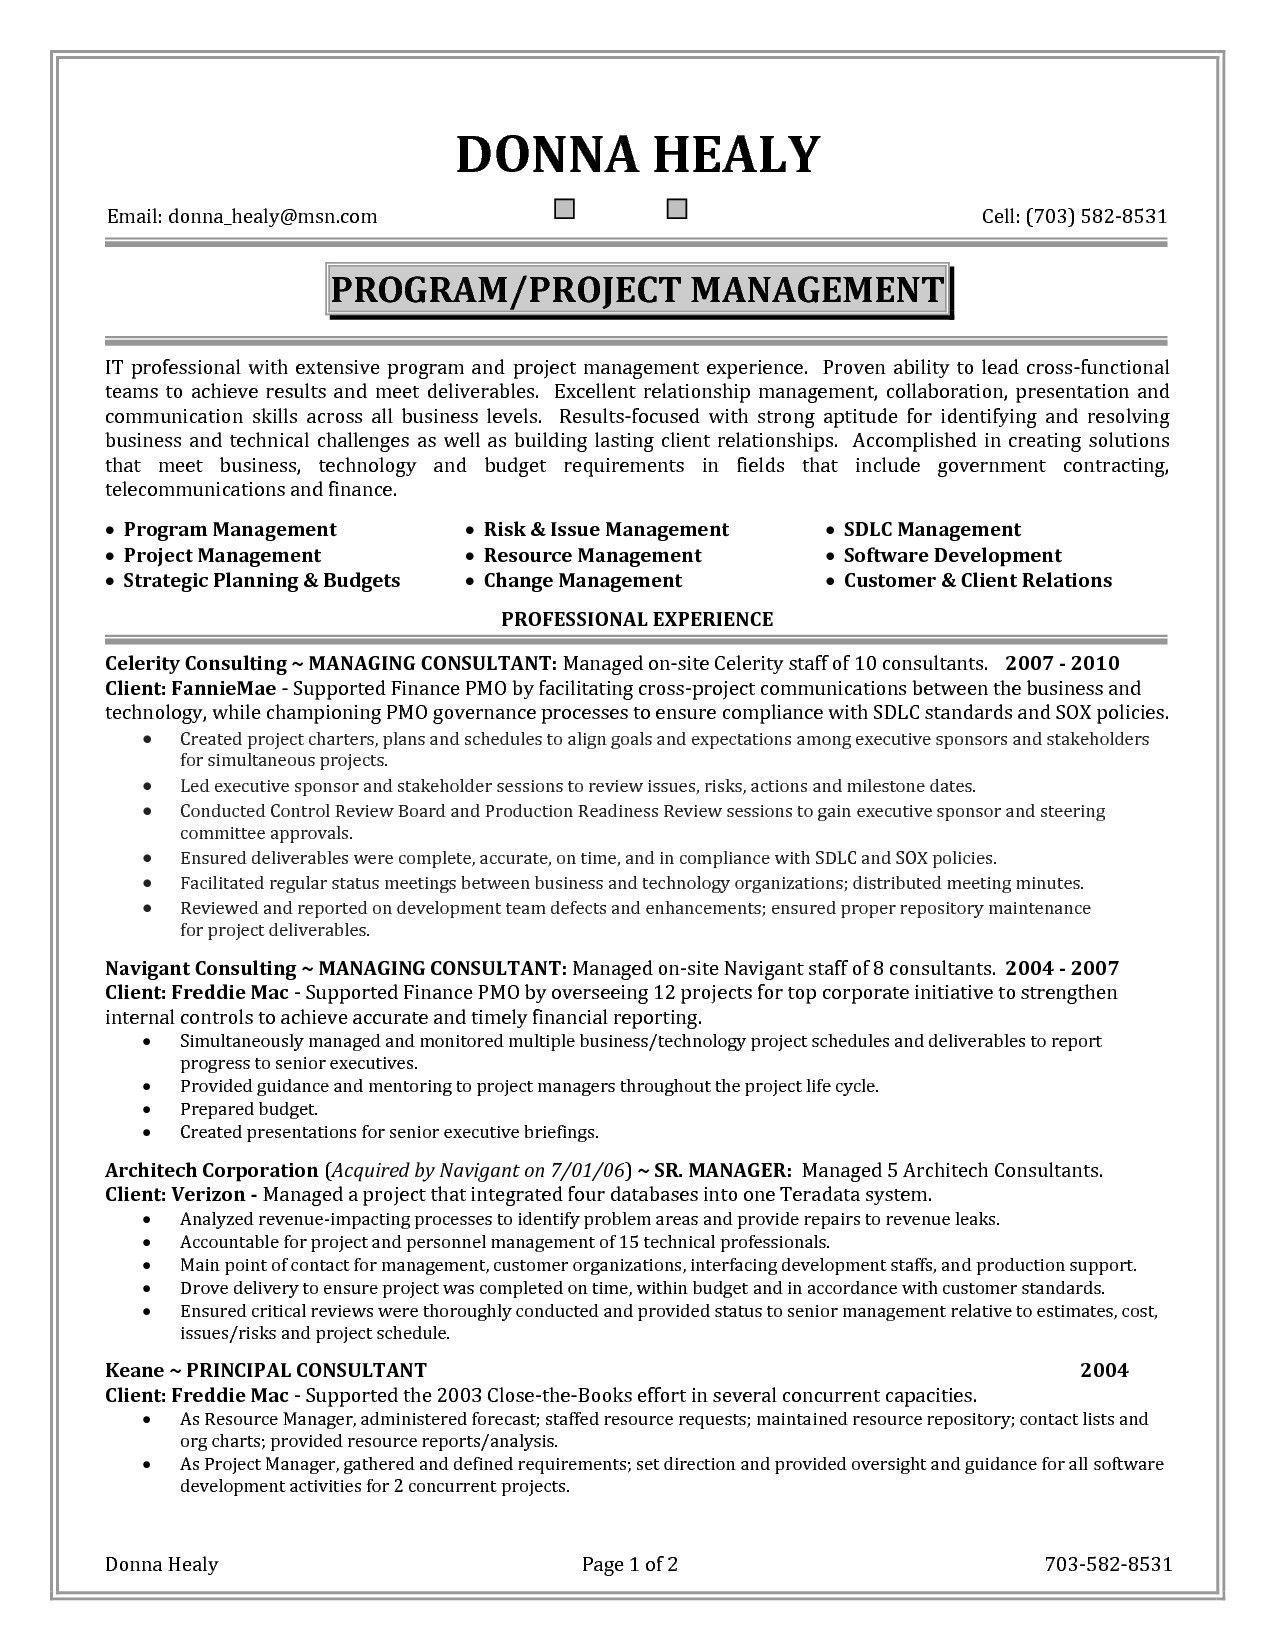 Finance Manager Resume Luxury New Resume Pdf Beautiful Resume Examples Pdf Best Resume Pdf 0d Fin Project Manager Resume Time Management Skills Resume Skills